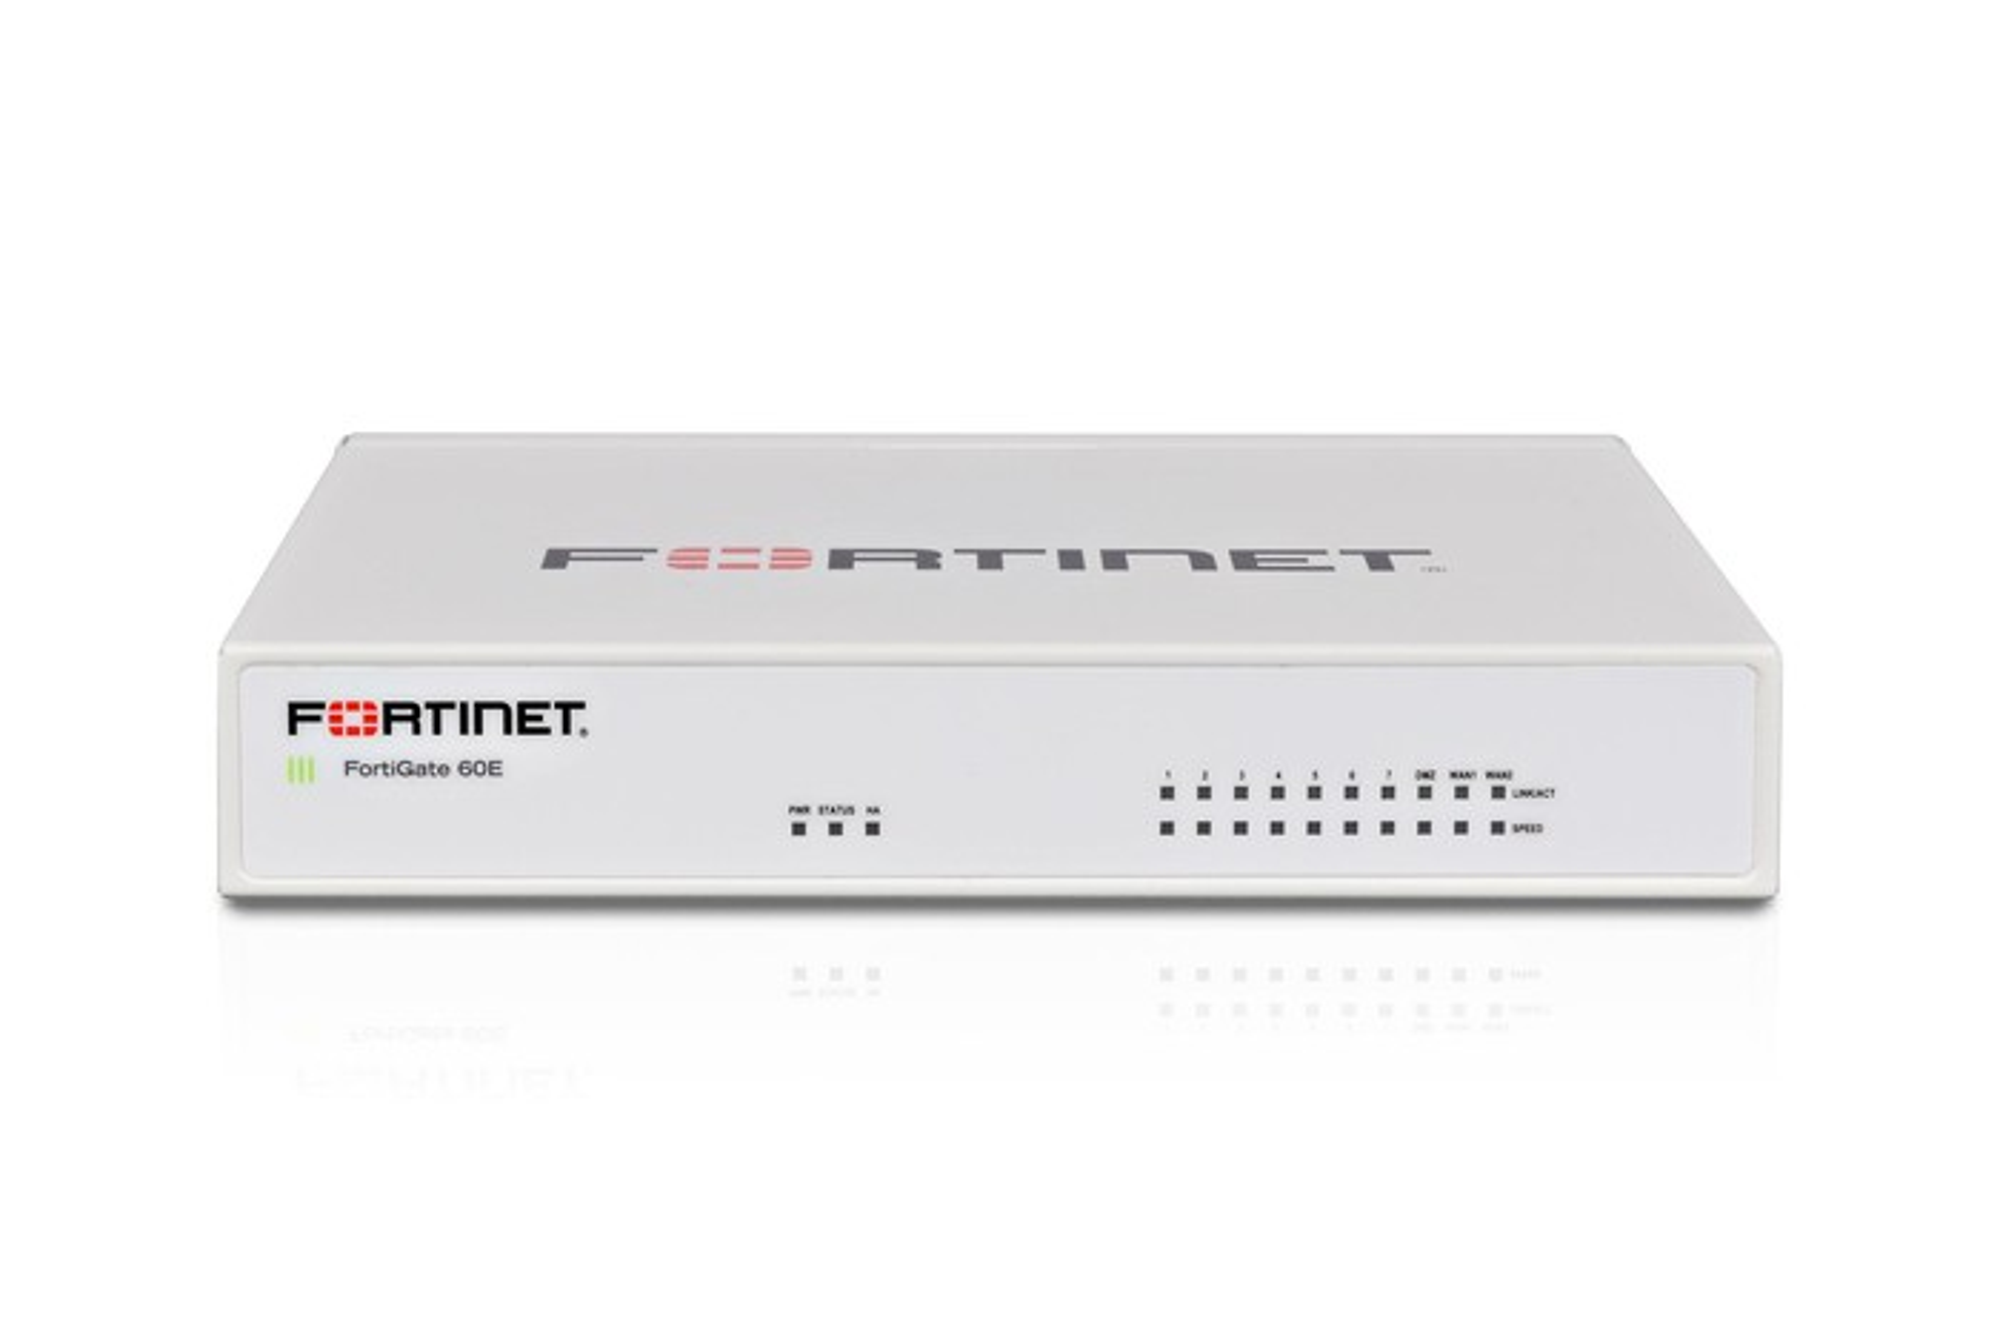 Fortinet hardware.